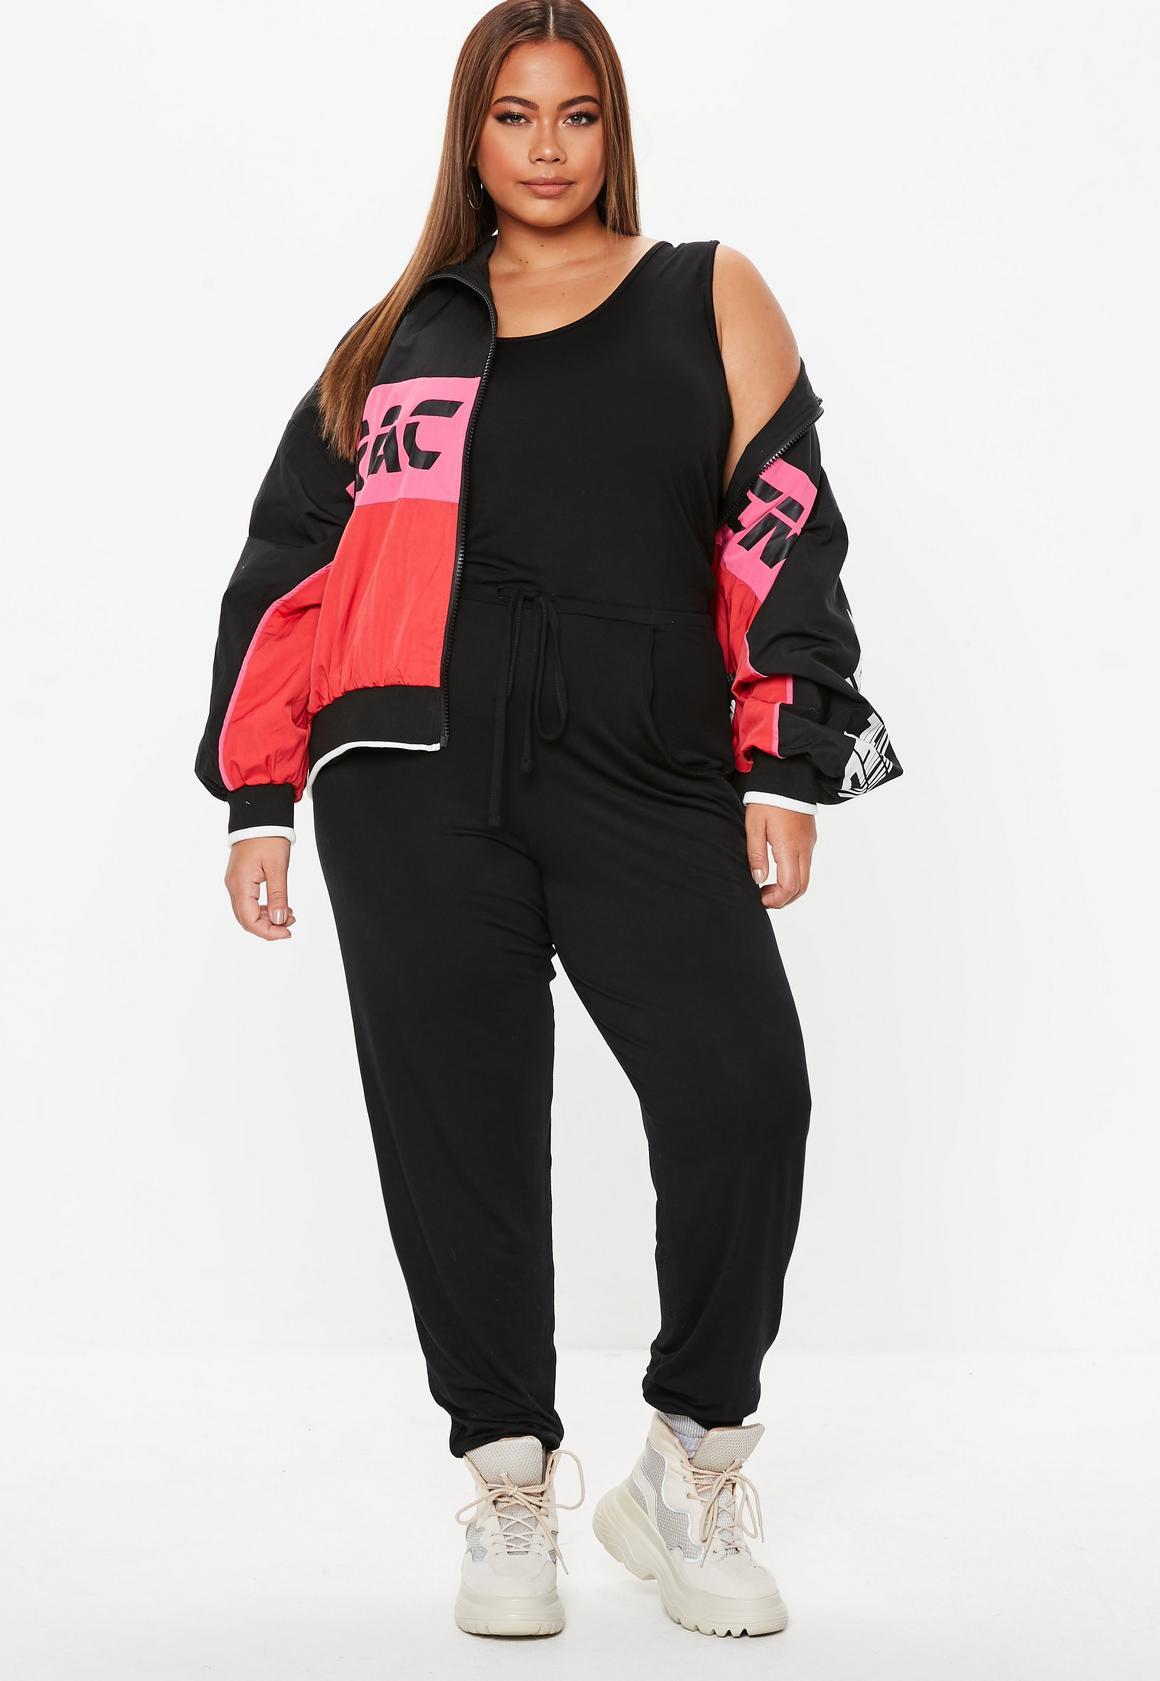 online retailer Clearance sale uk cheap sale Plus Size Black Sleeveless Tie Waist Jumpsuit